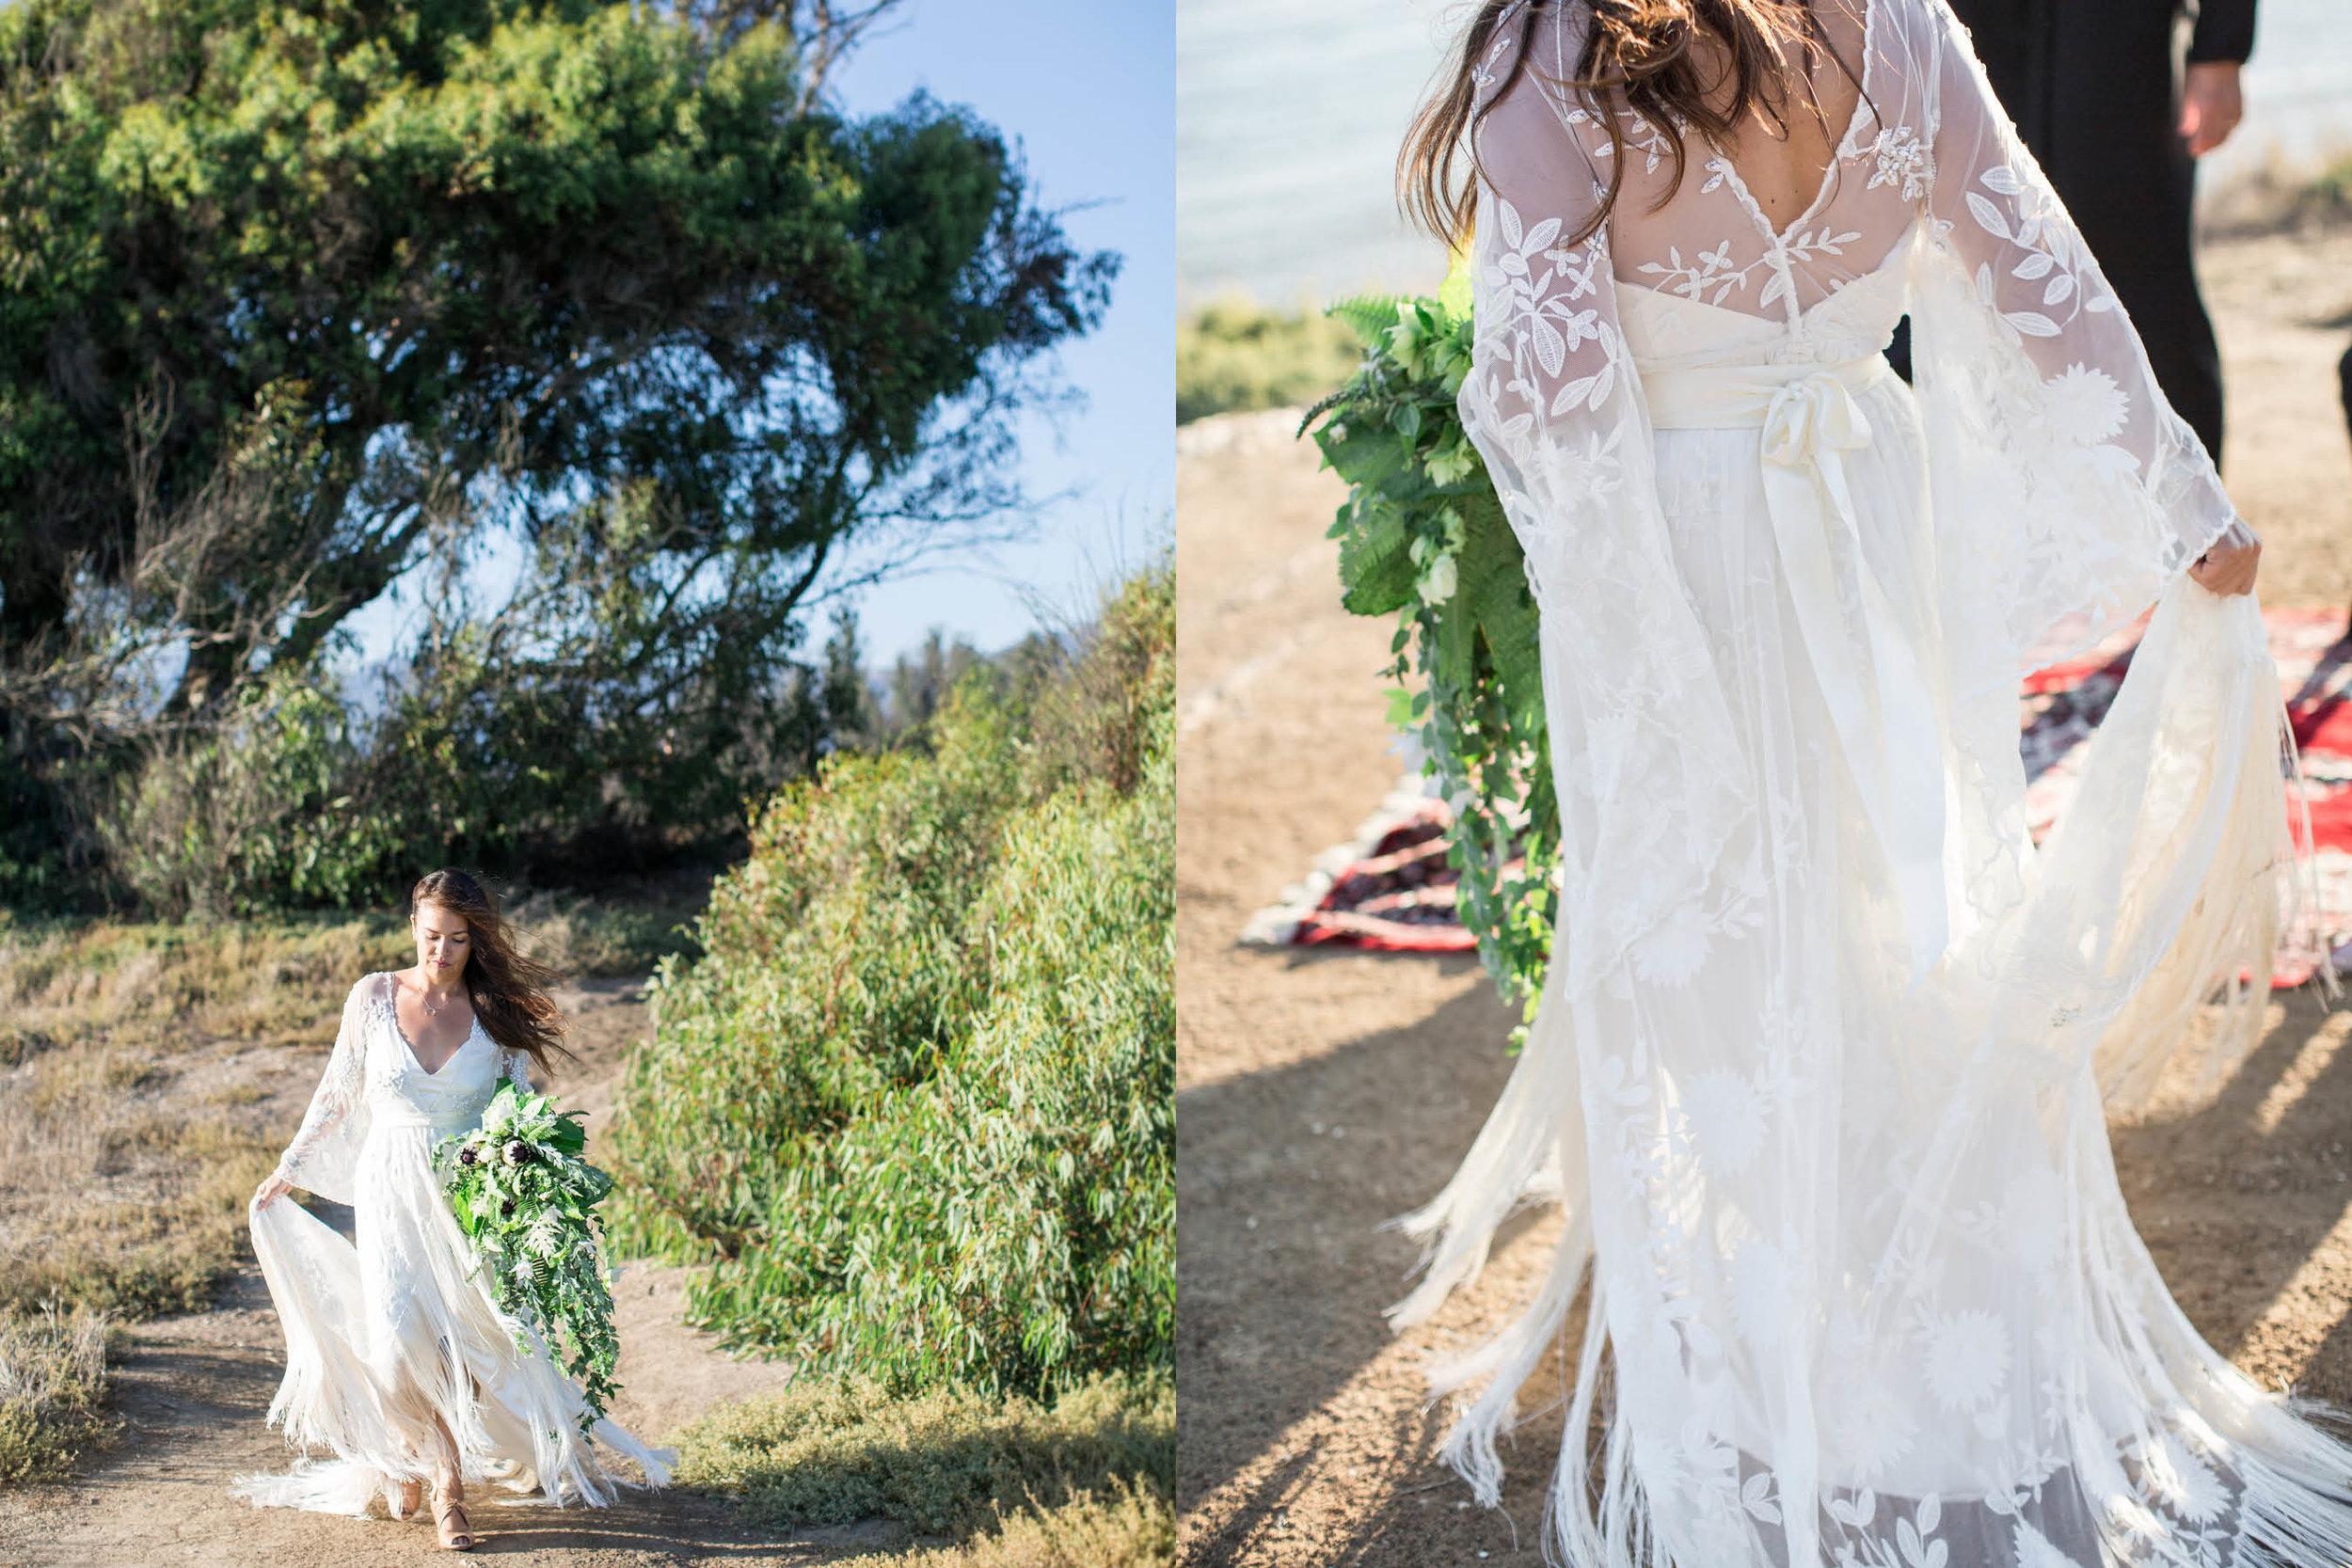 santa-barbara-elopement-elope-wedding-pop-up-coordinator-day-of-event-planning-planner-ellwood-bluff-eucalyptus-grove-rustic-ocean-view-front-hop-green-suit (1 (14).jpg